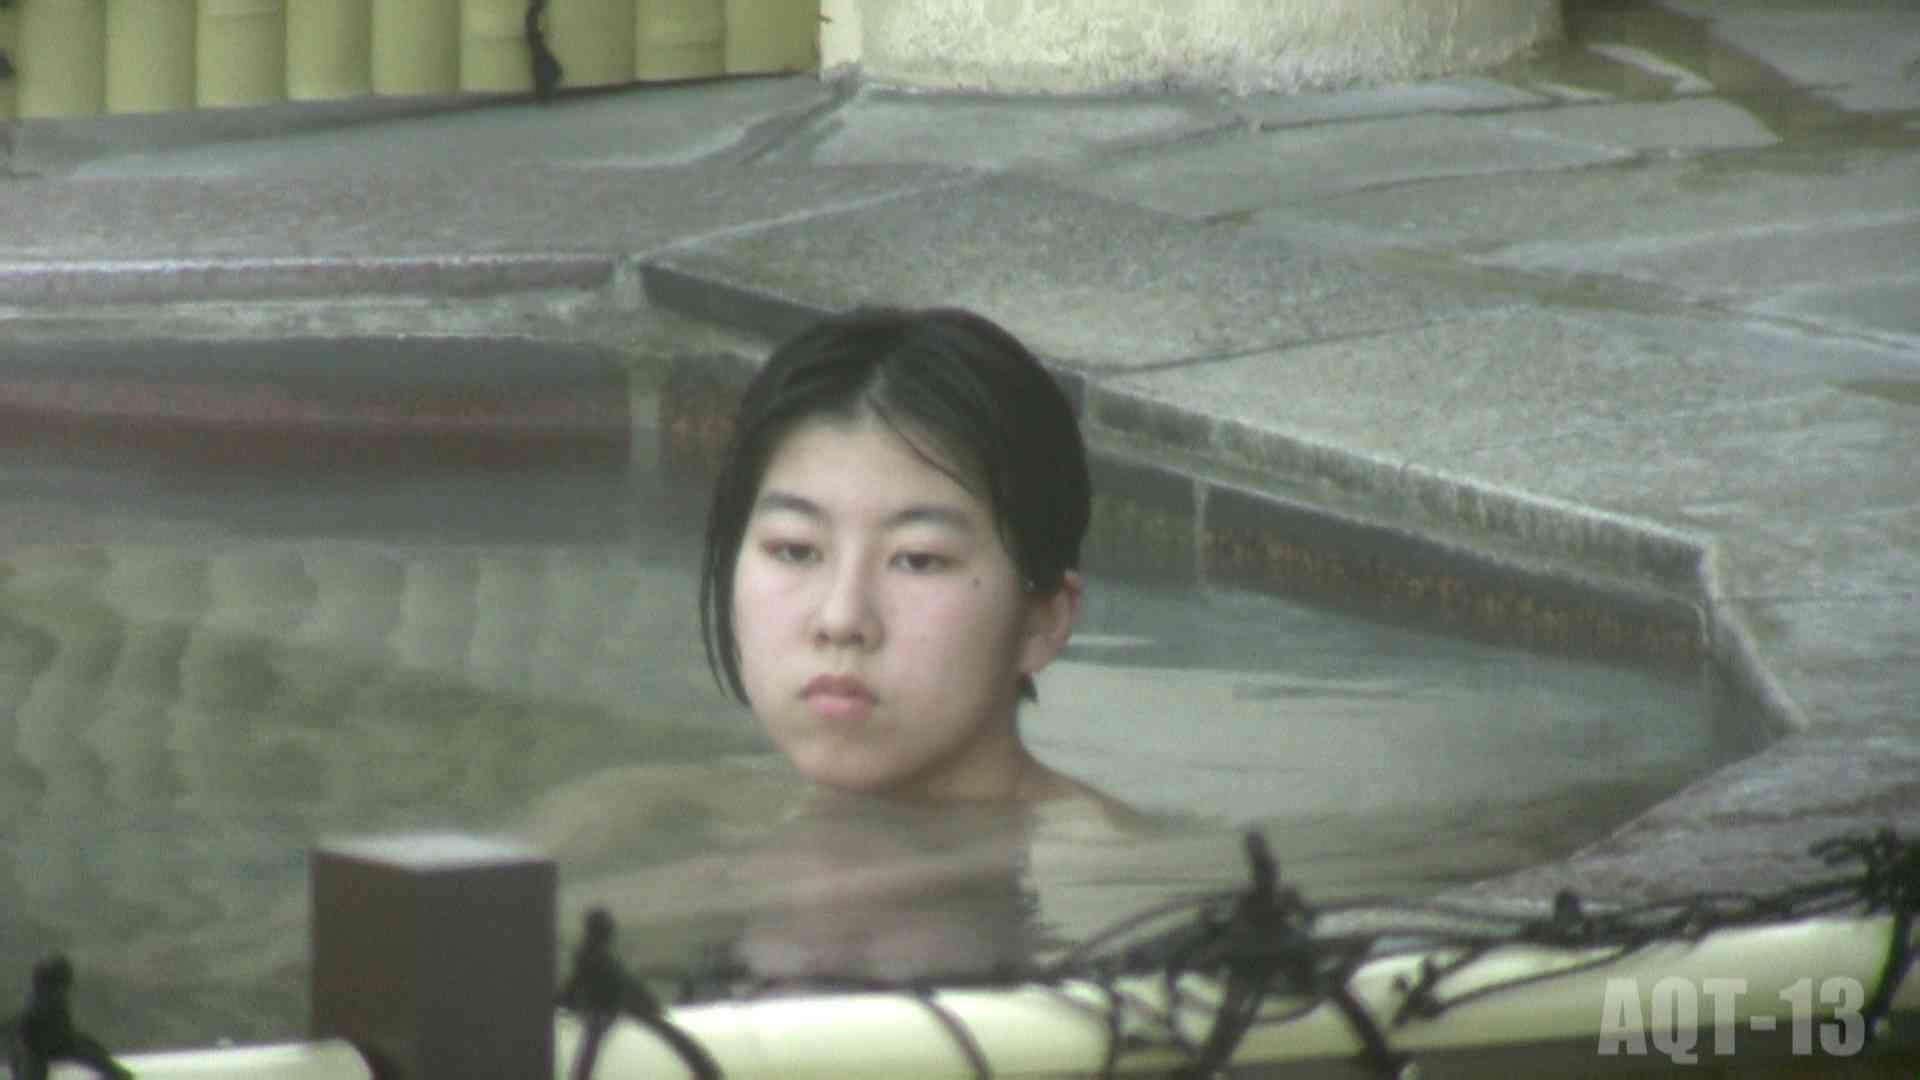 Aquaな露天風呂Vol.816 OLセックス  80画像 33